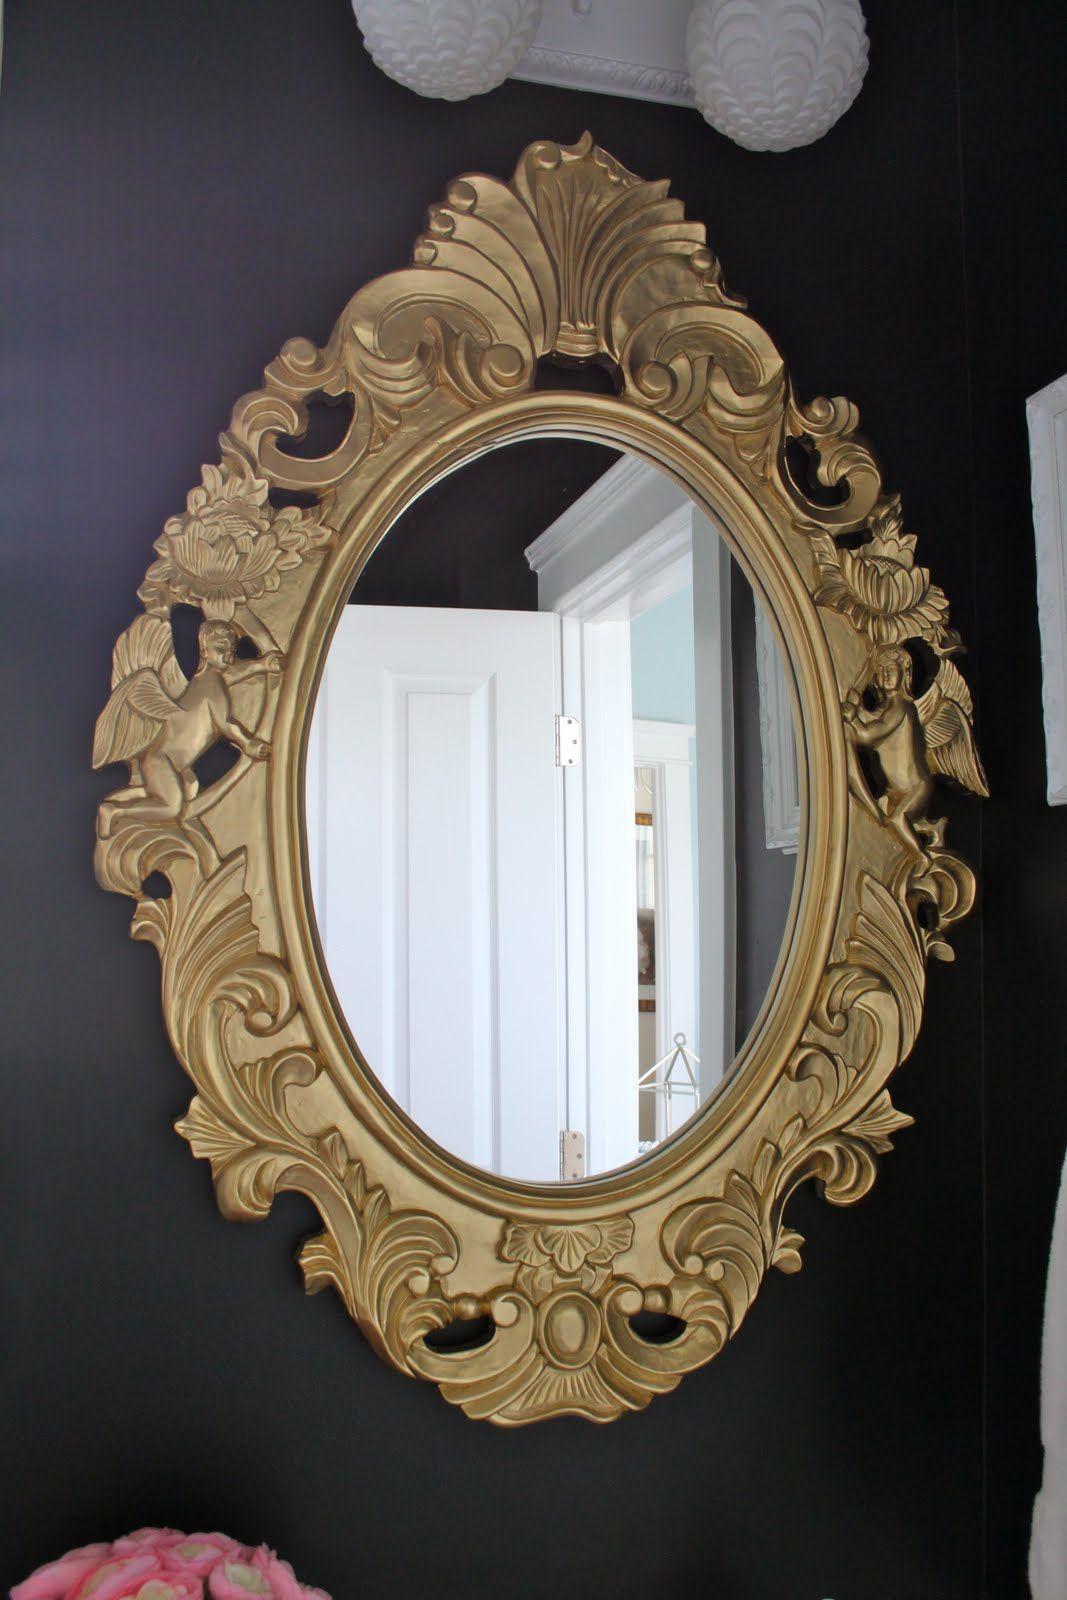 Dwellings by devore mirror mirror mirror gold spray